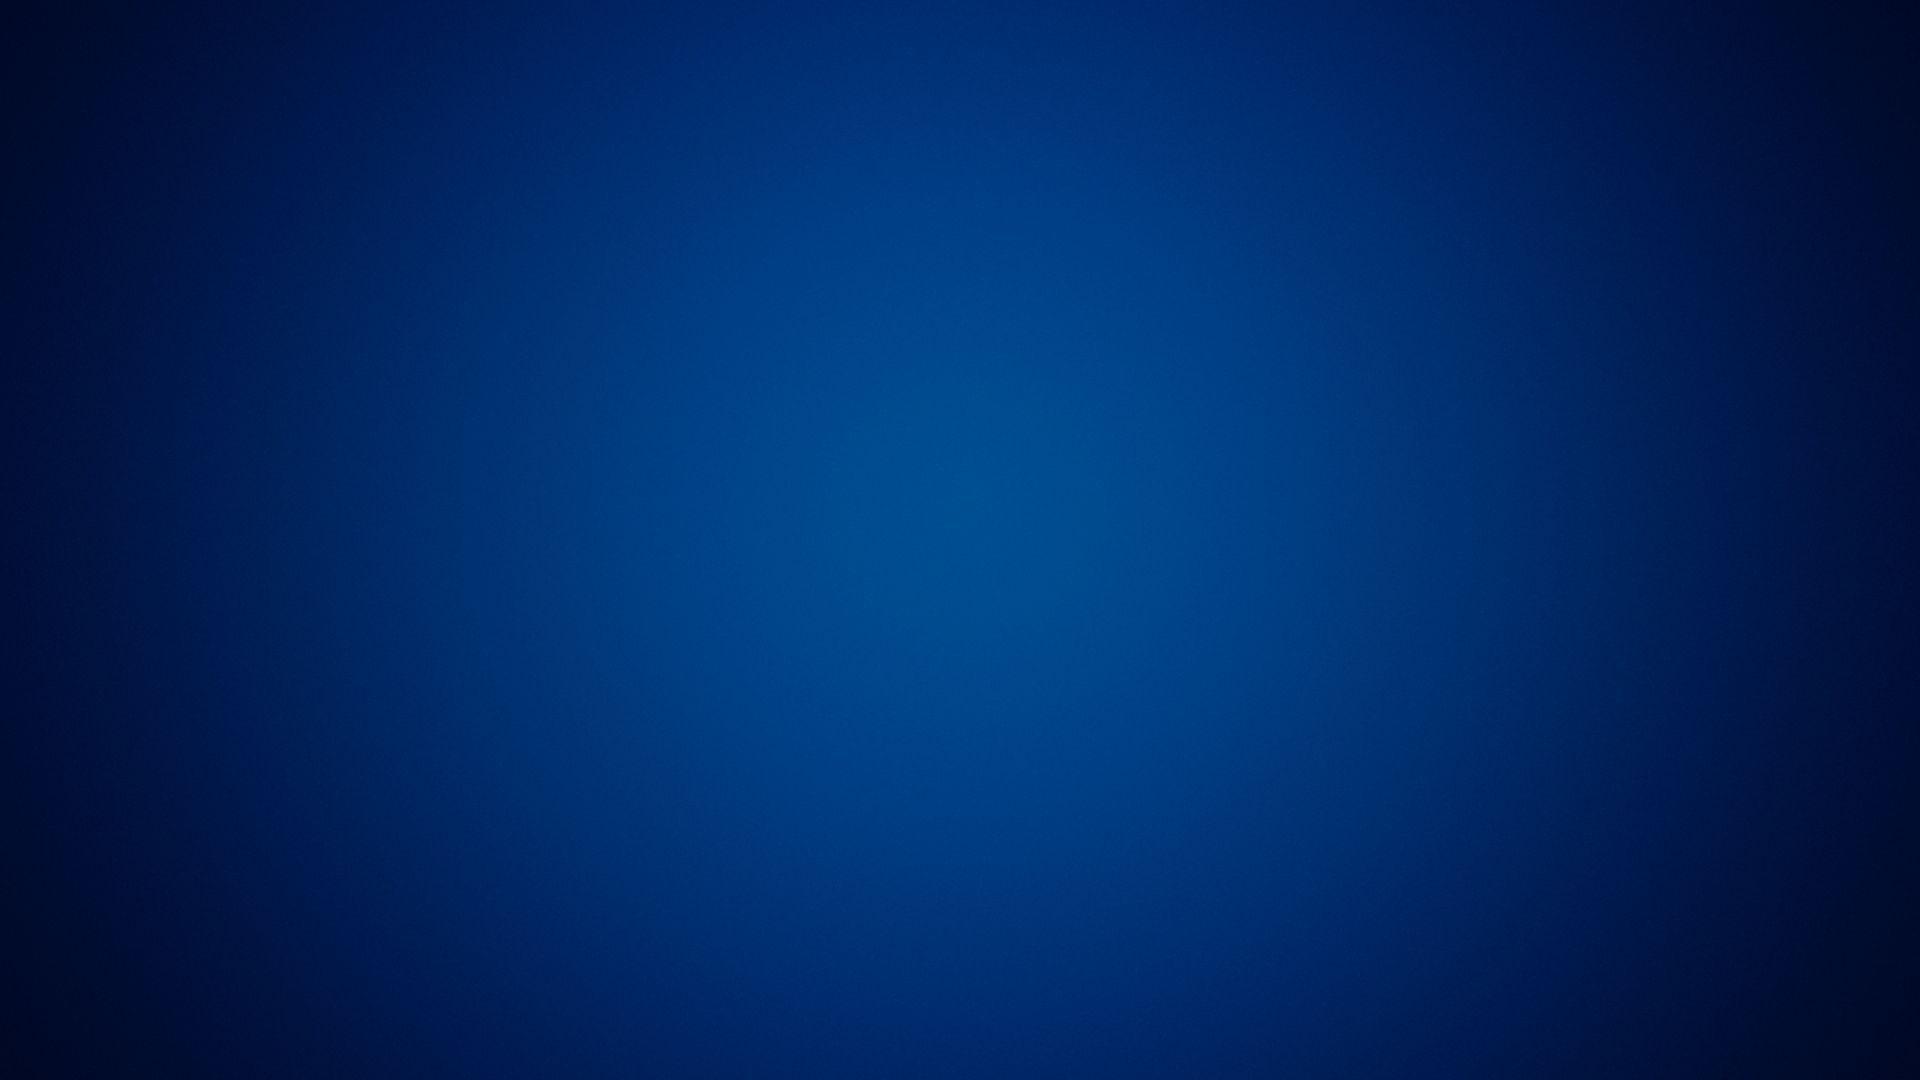 wallpaper background gradient blue - photo #9